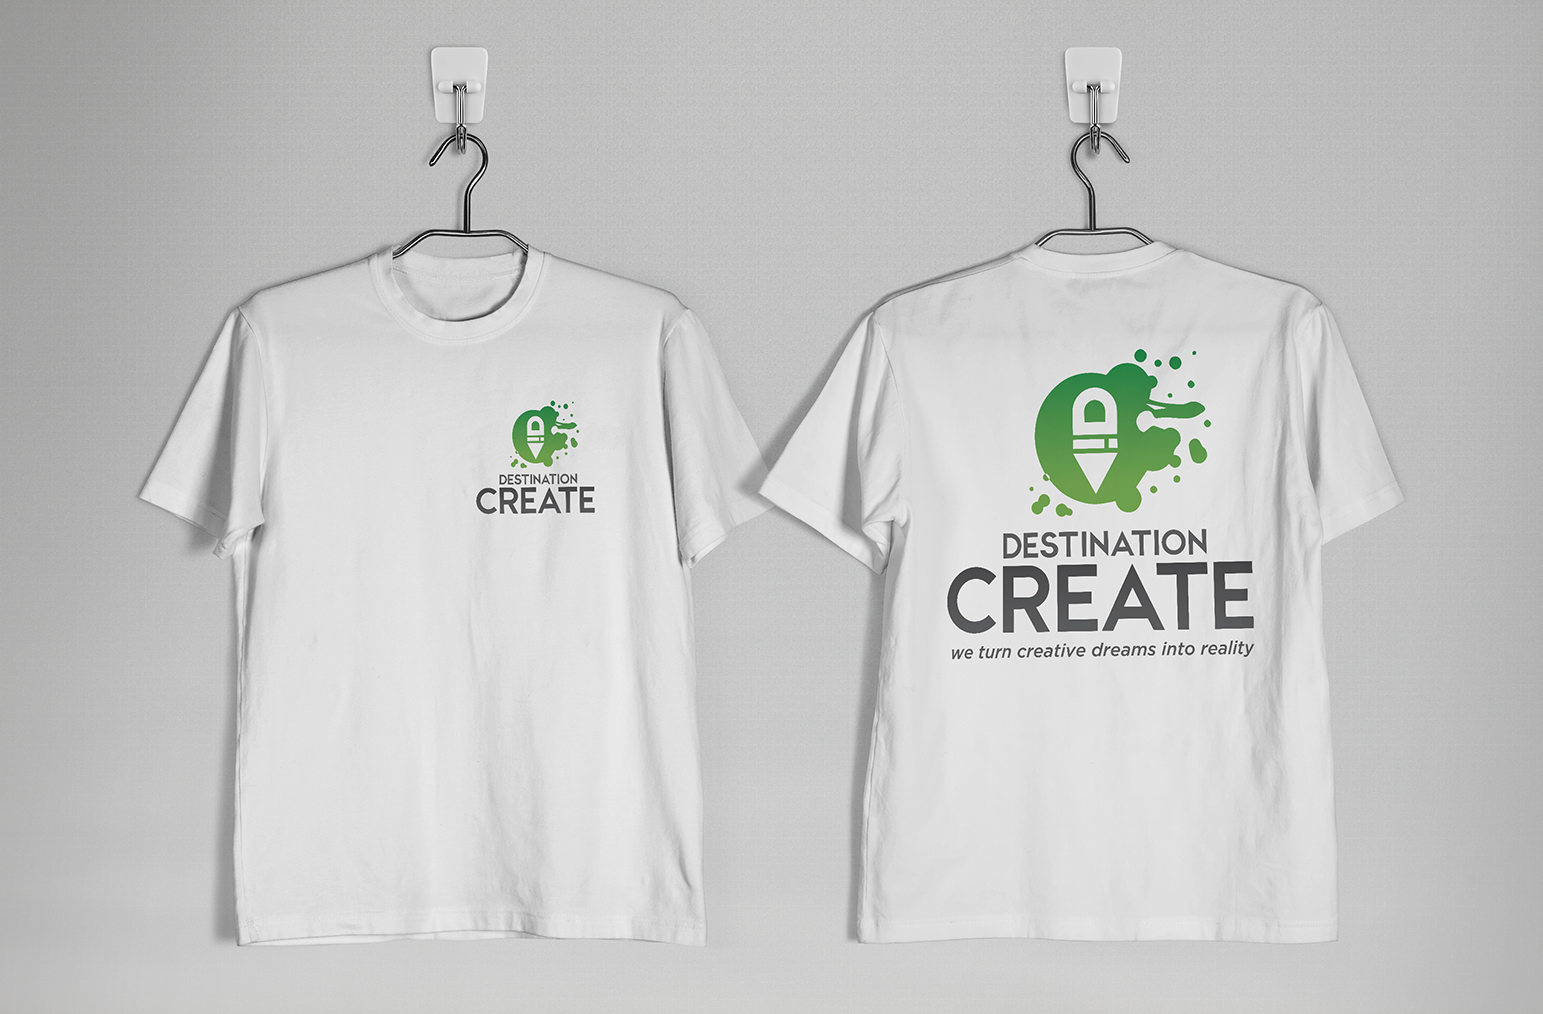 Destination Create shirts